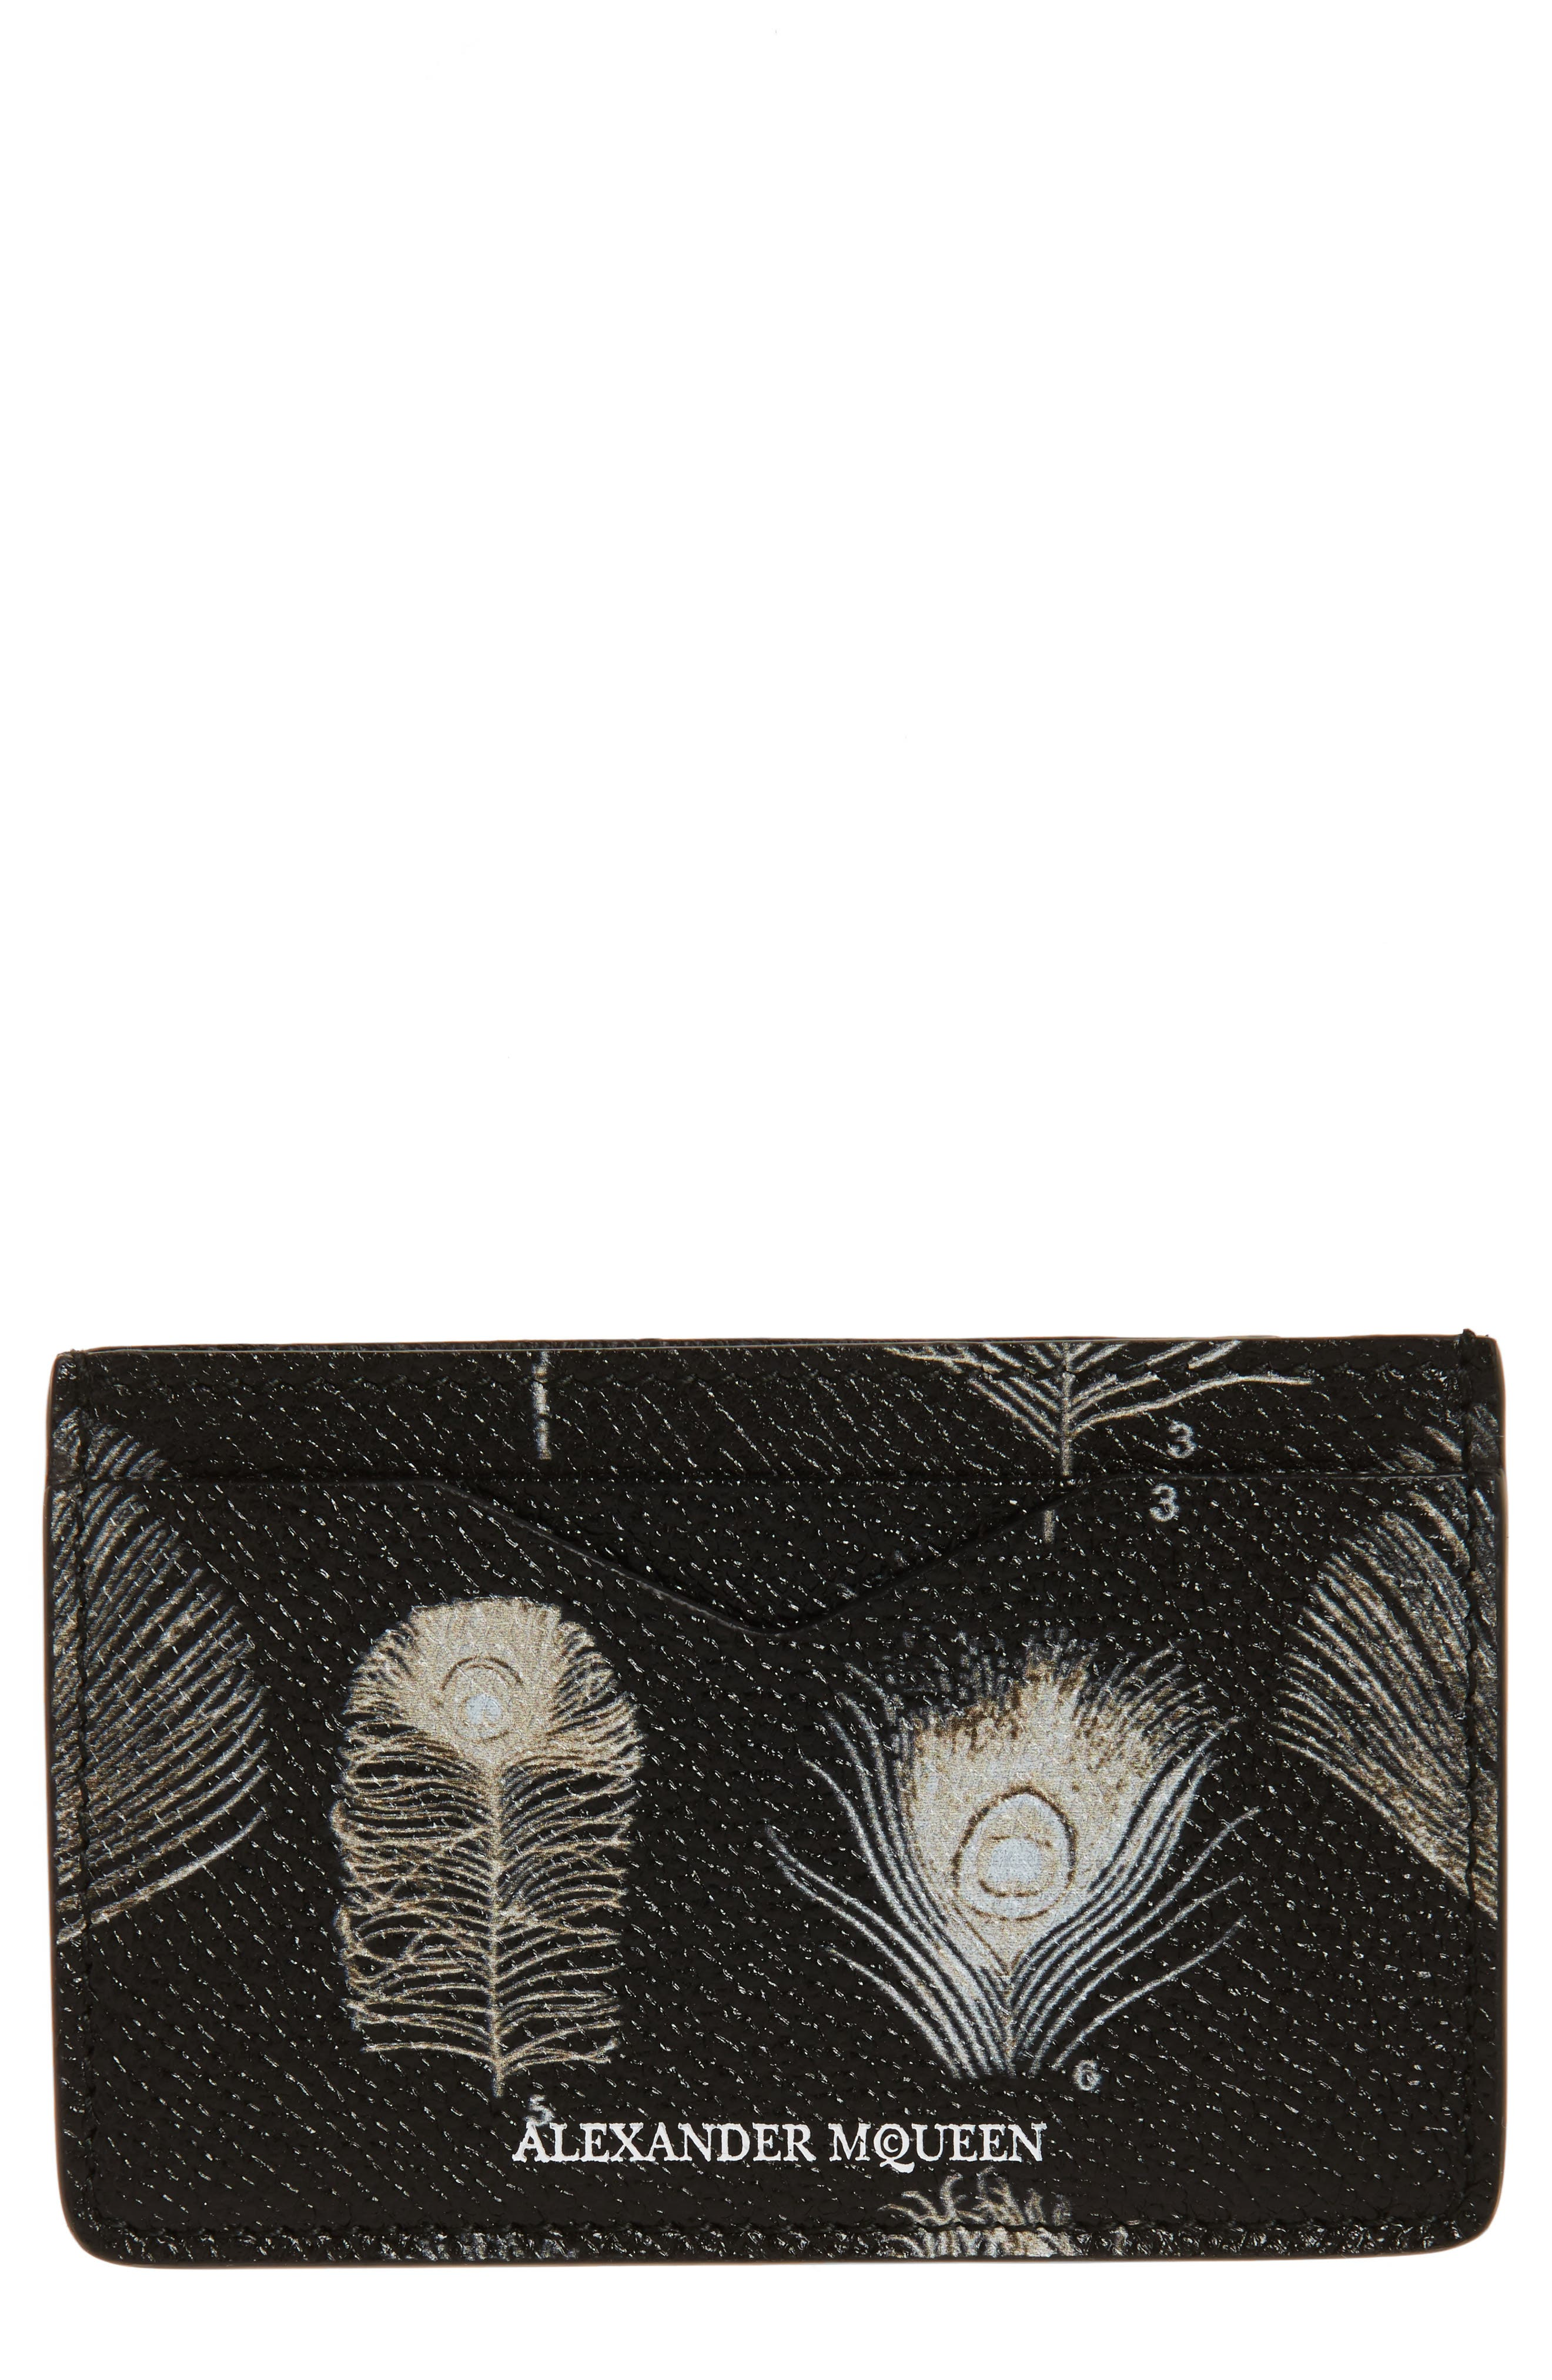 Alexander McQueen Peacock Feather Leather Card Case